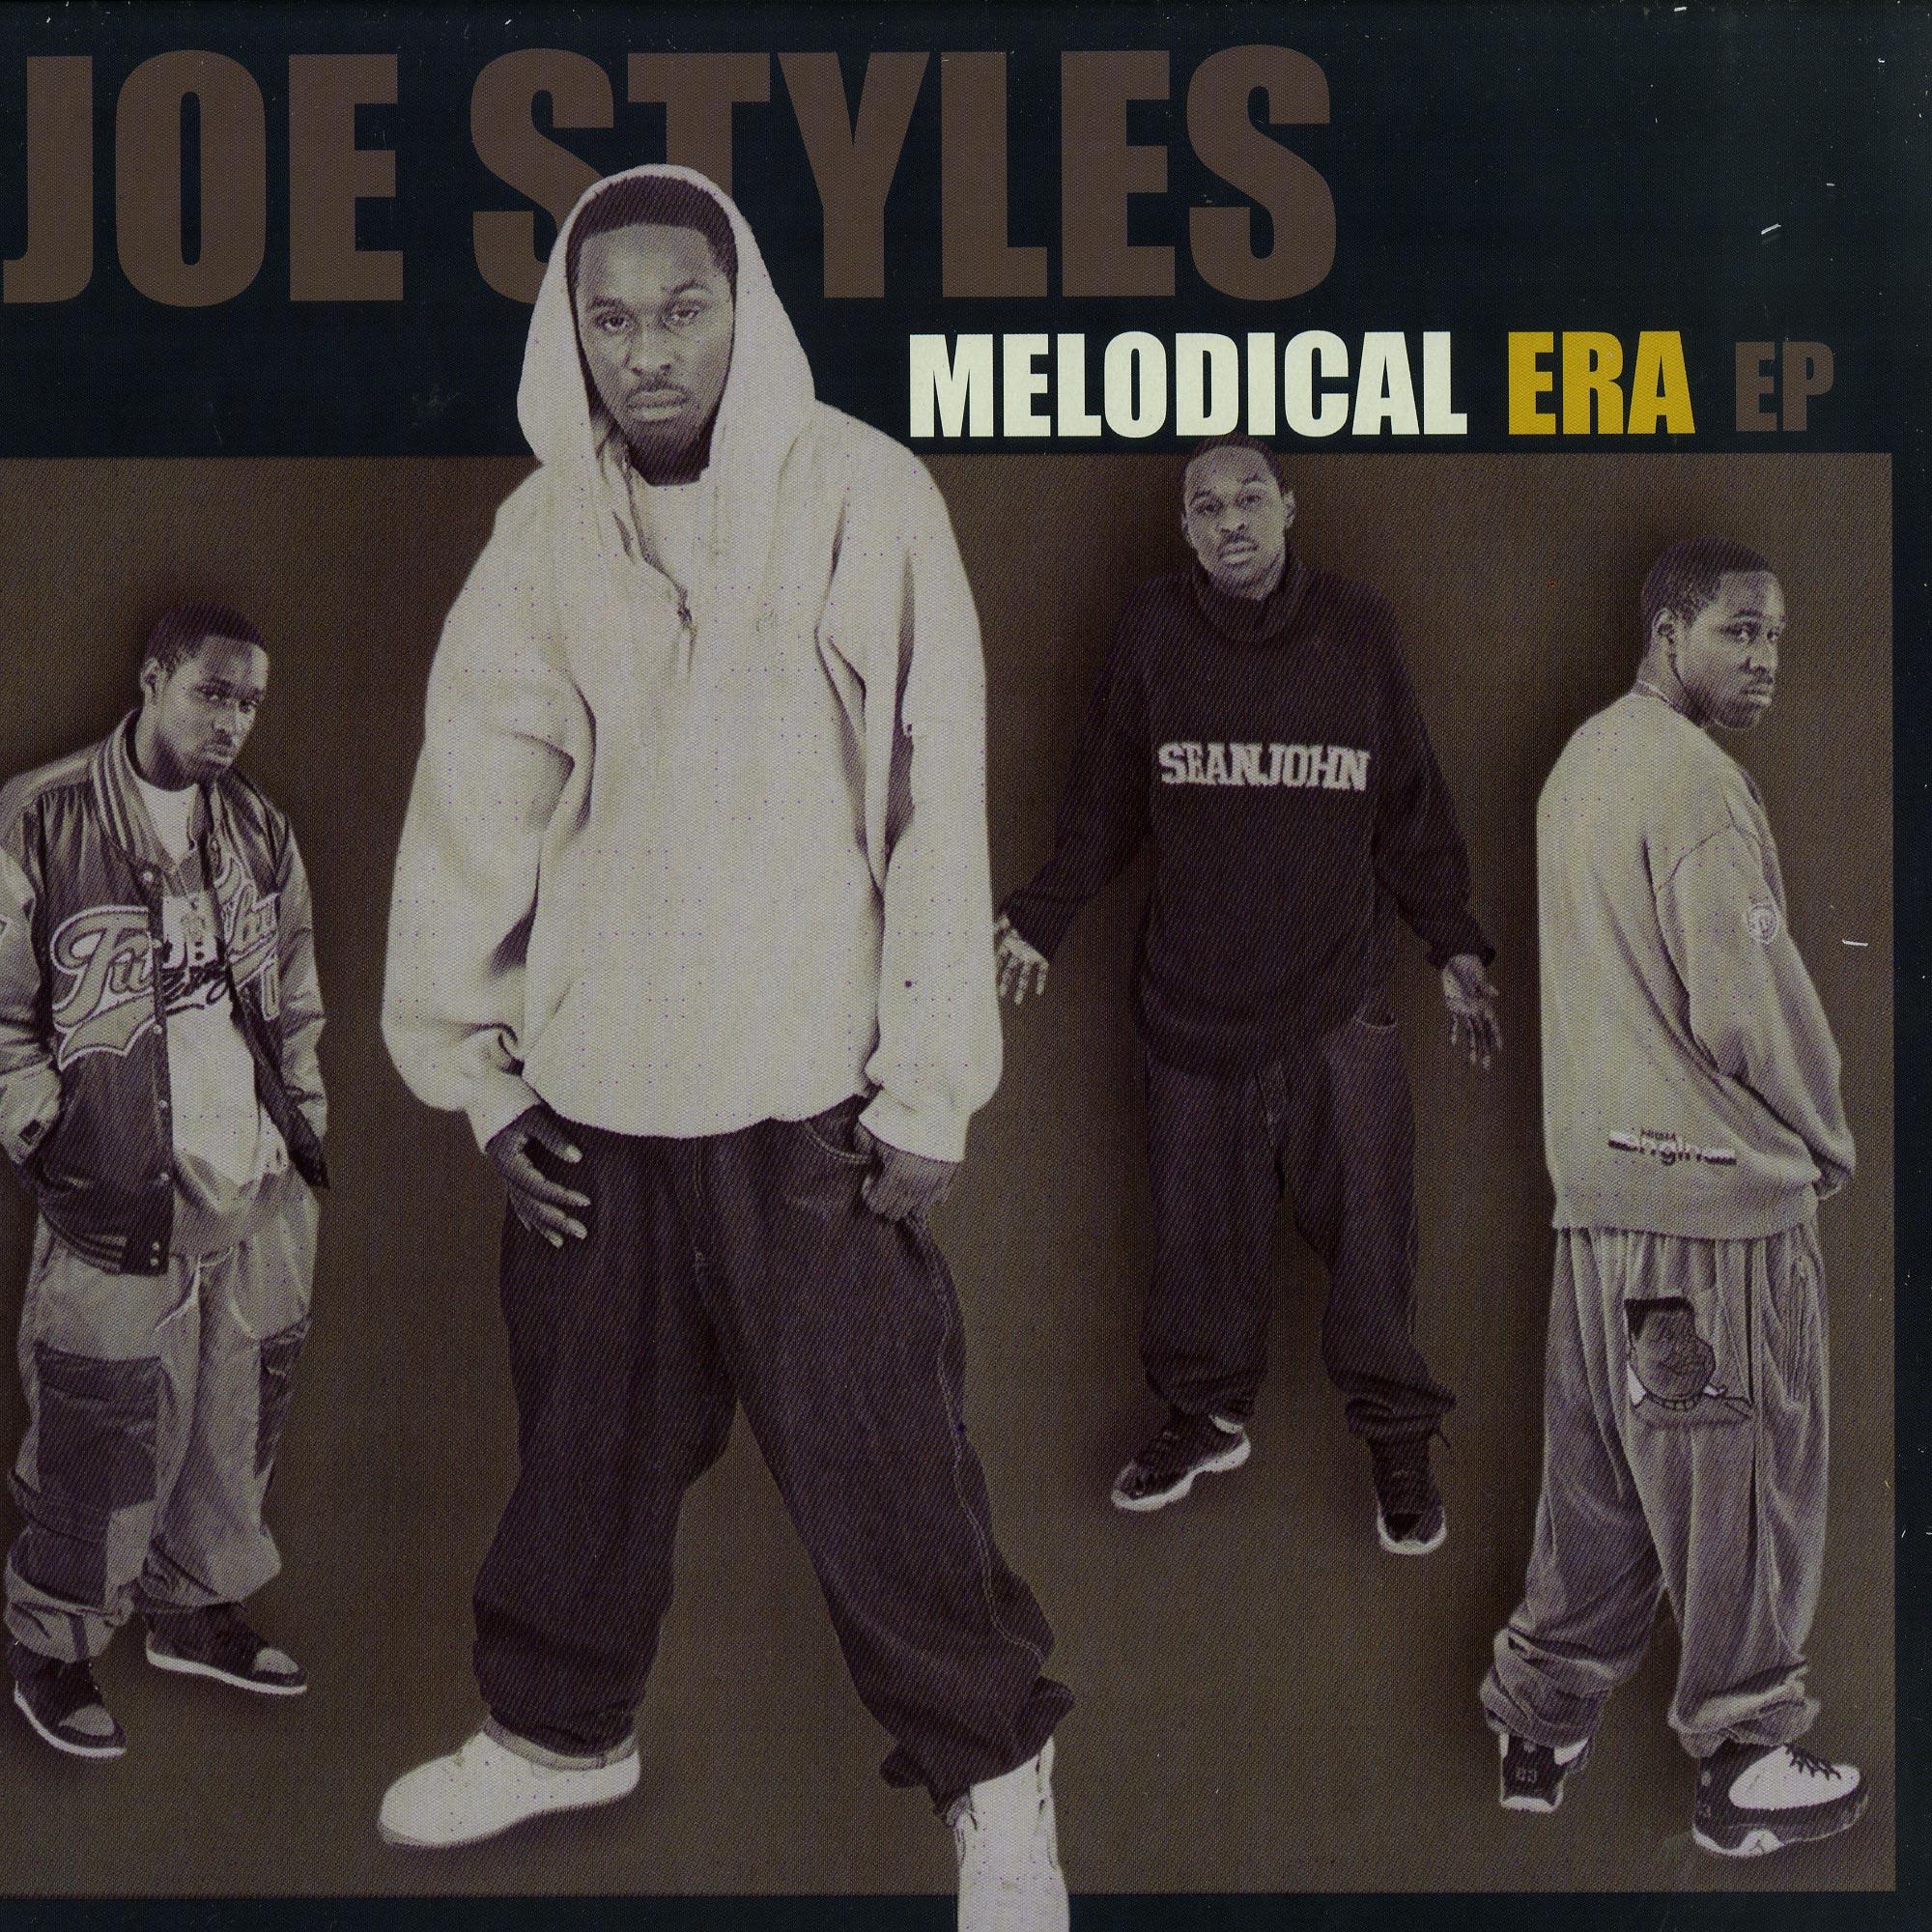 Joe Styles - MELODICAL ERA EP